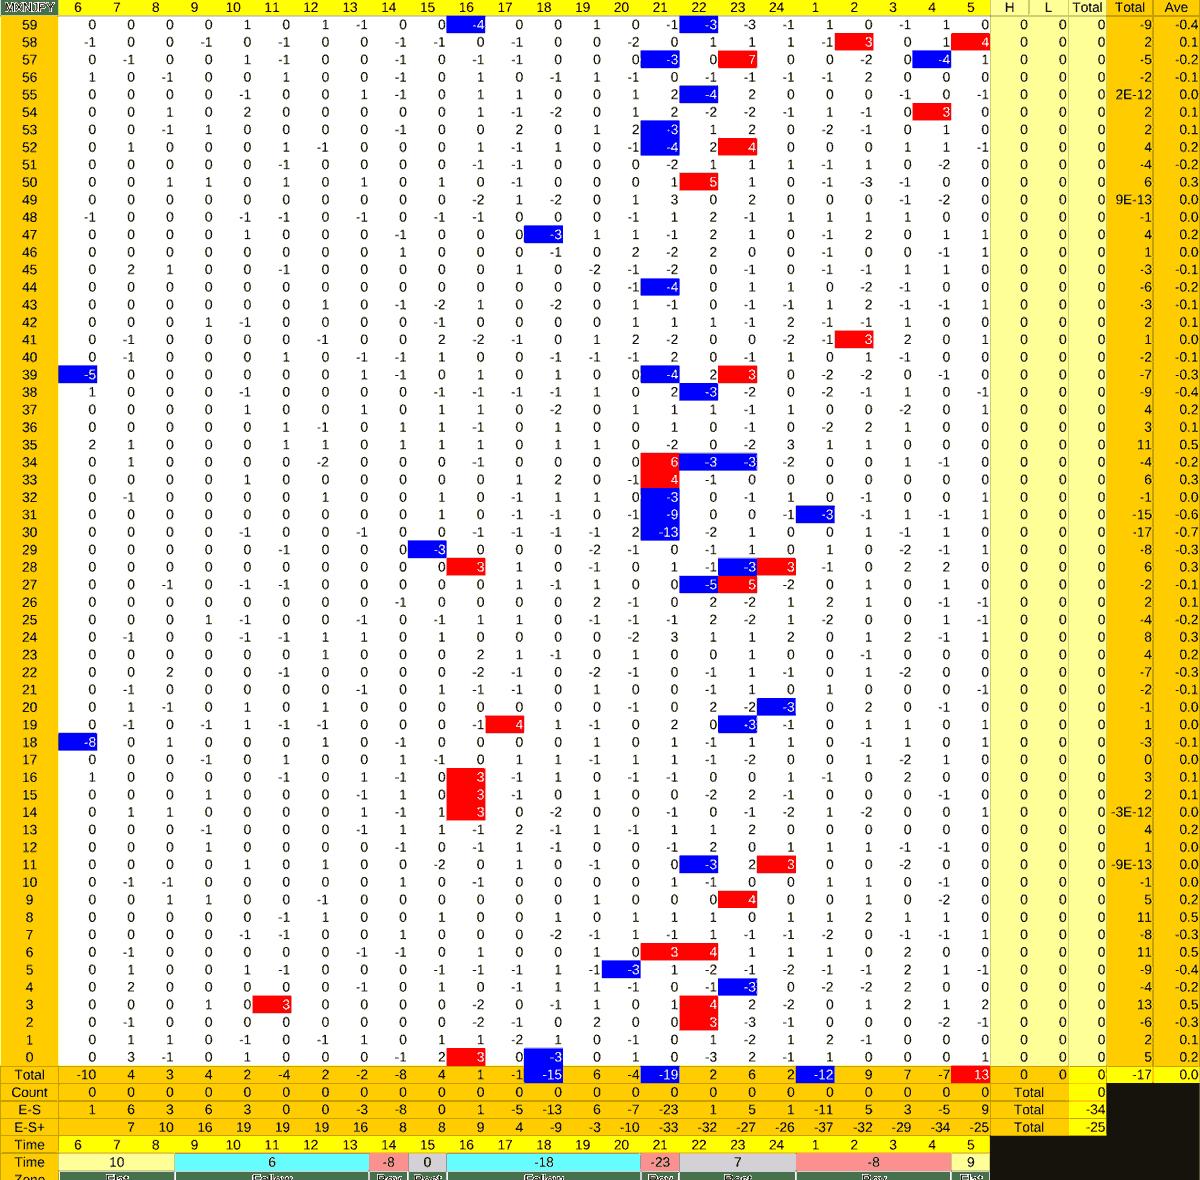 20210713_HS(3)MXNJPY-